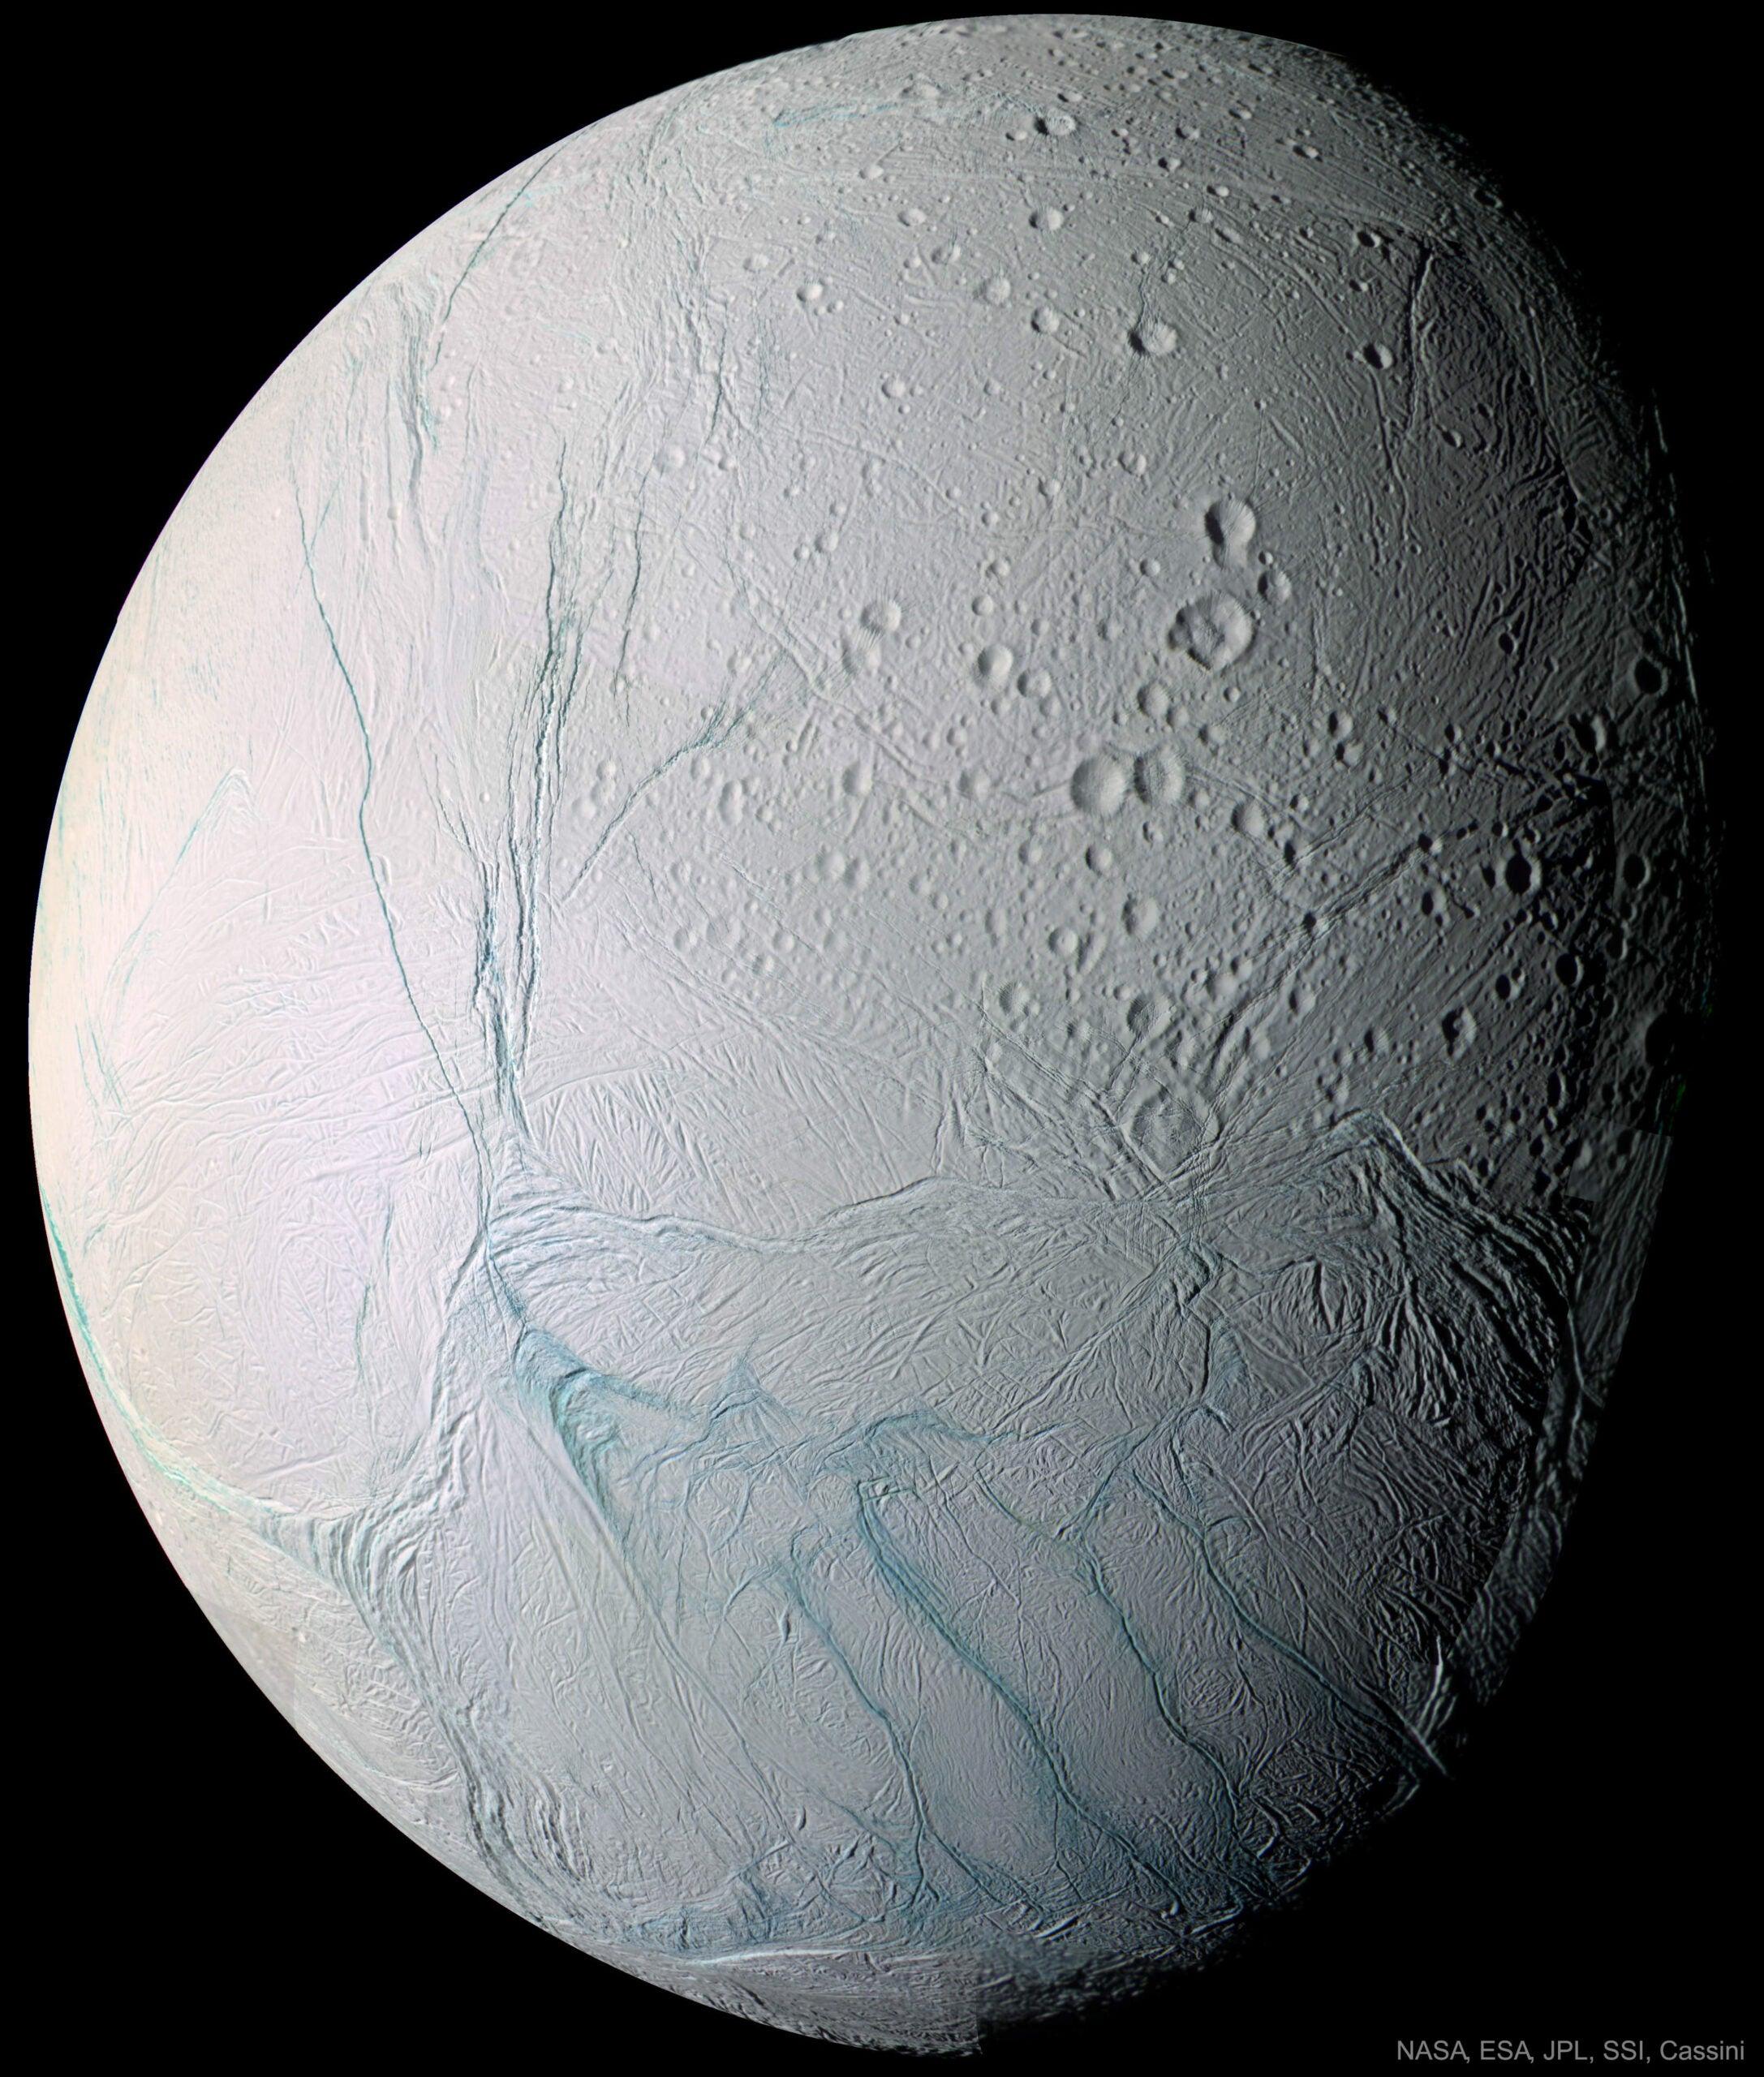 Enceladus imaged by Cassini